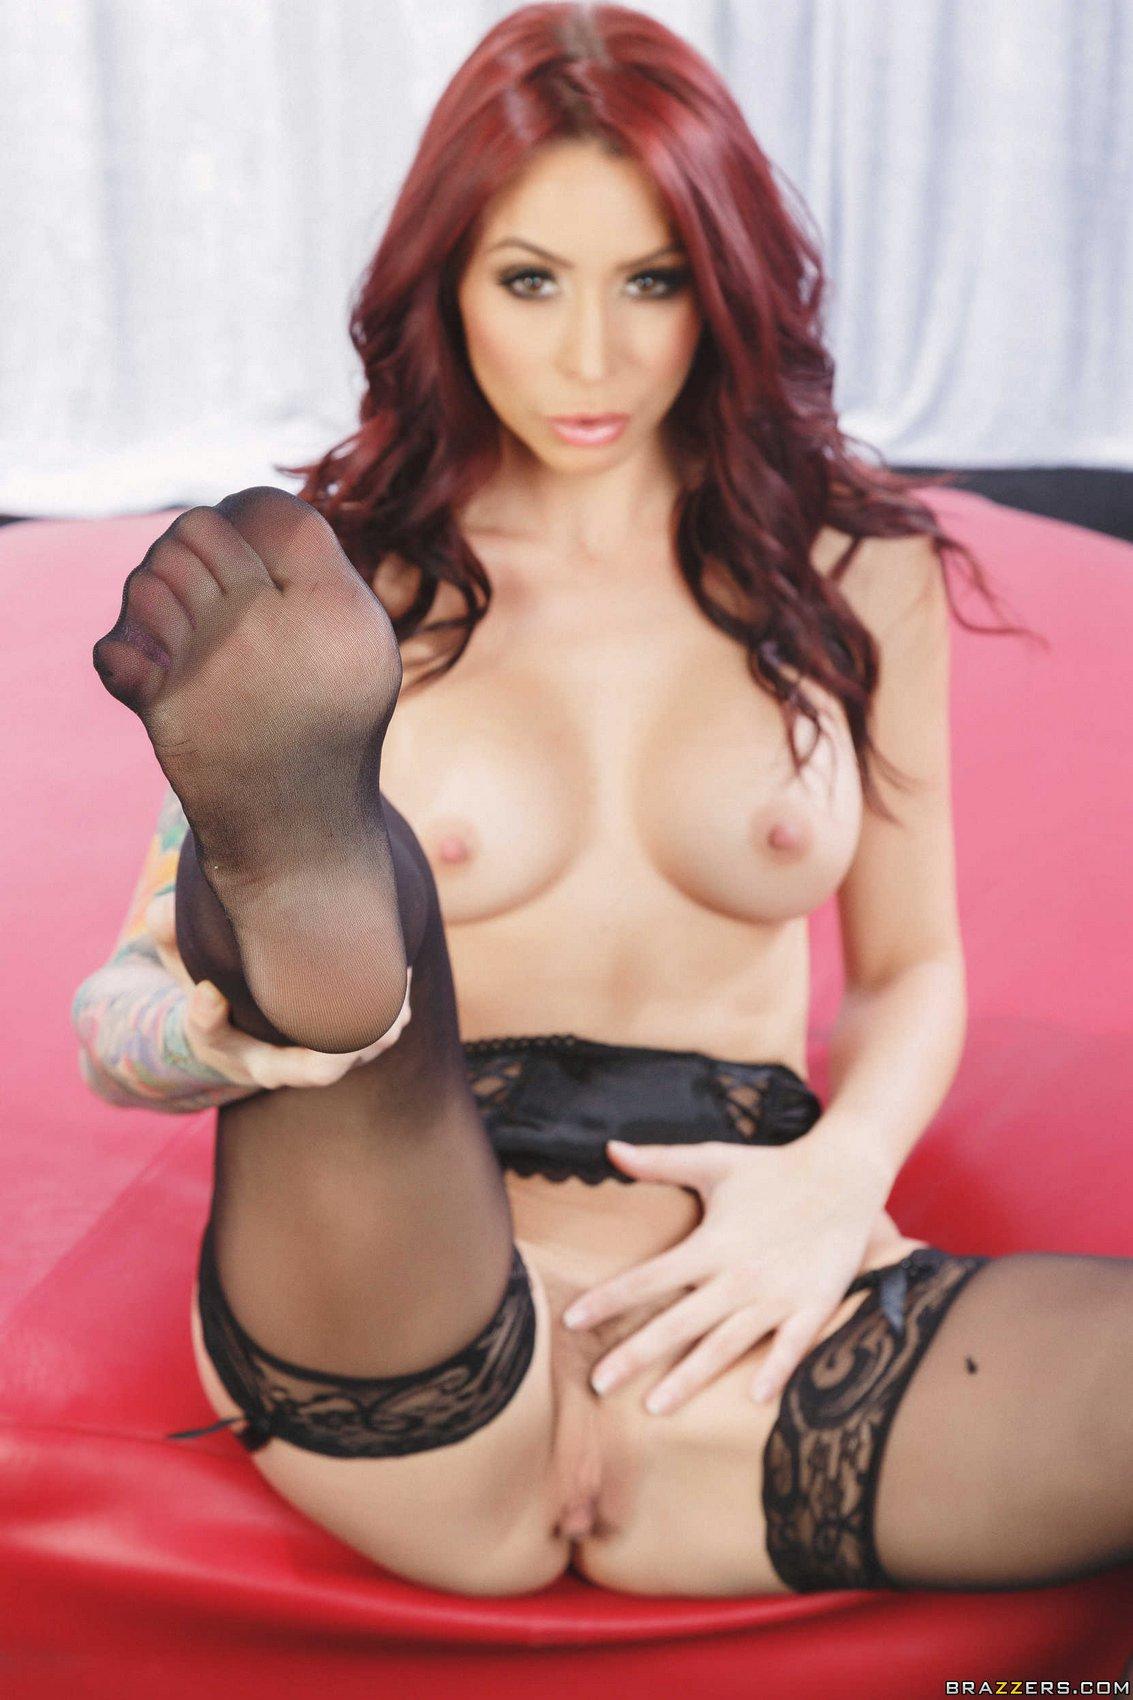 Monique alexander sex in sex games cancun scandalplanetcom 2